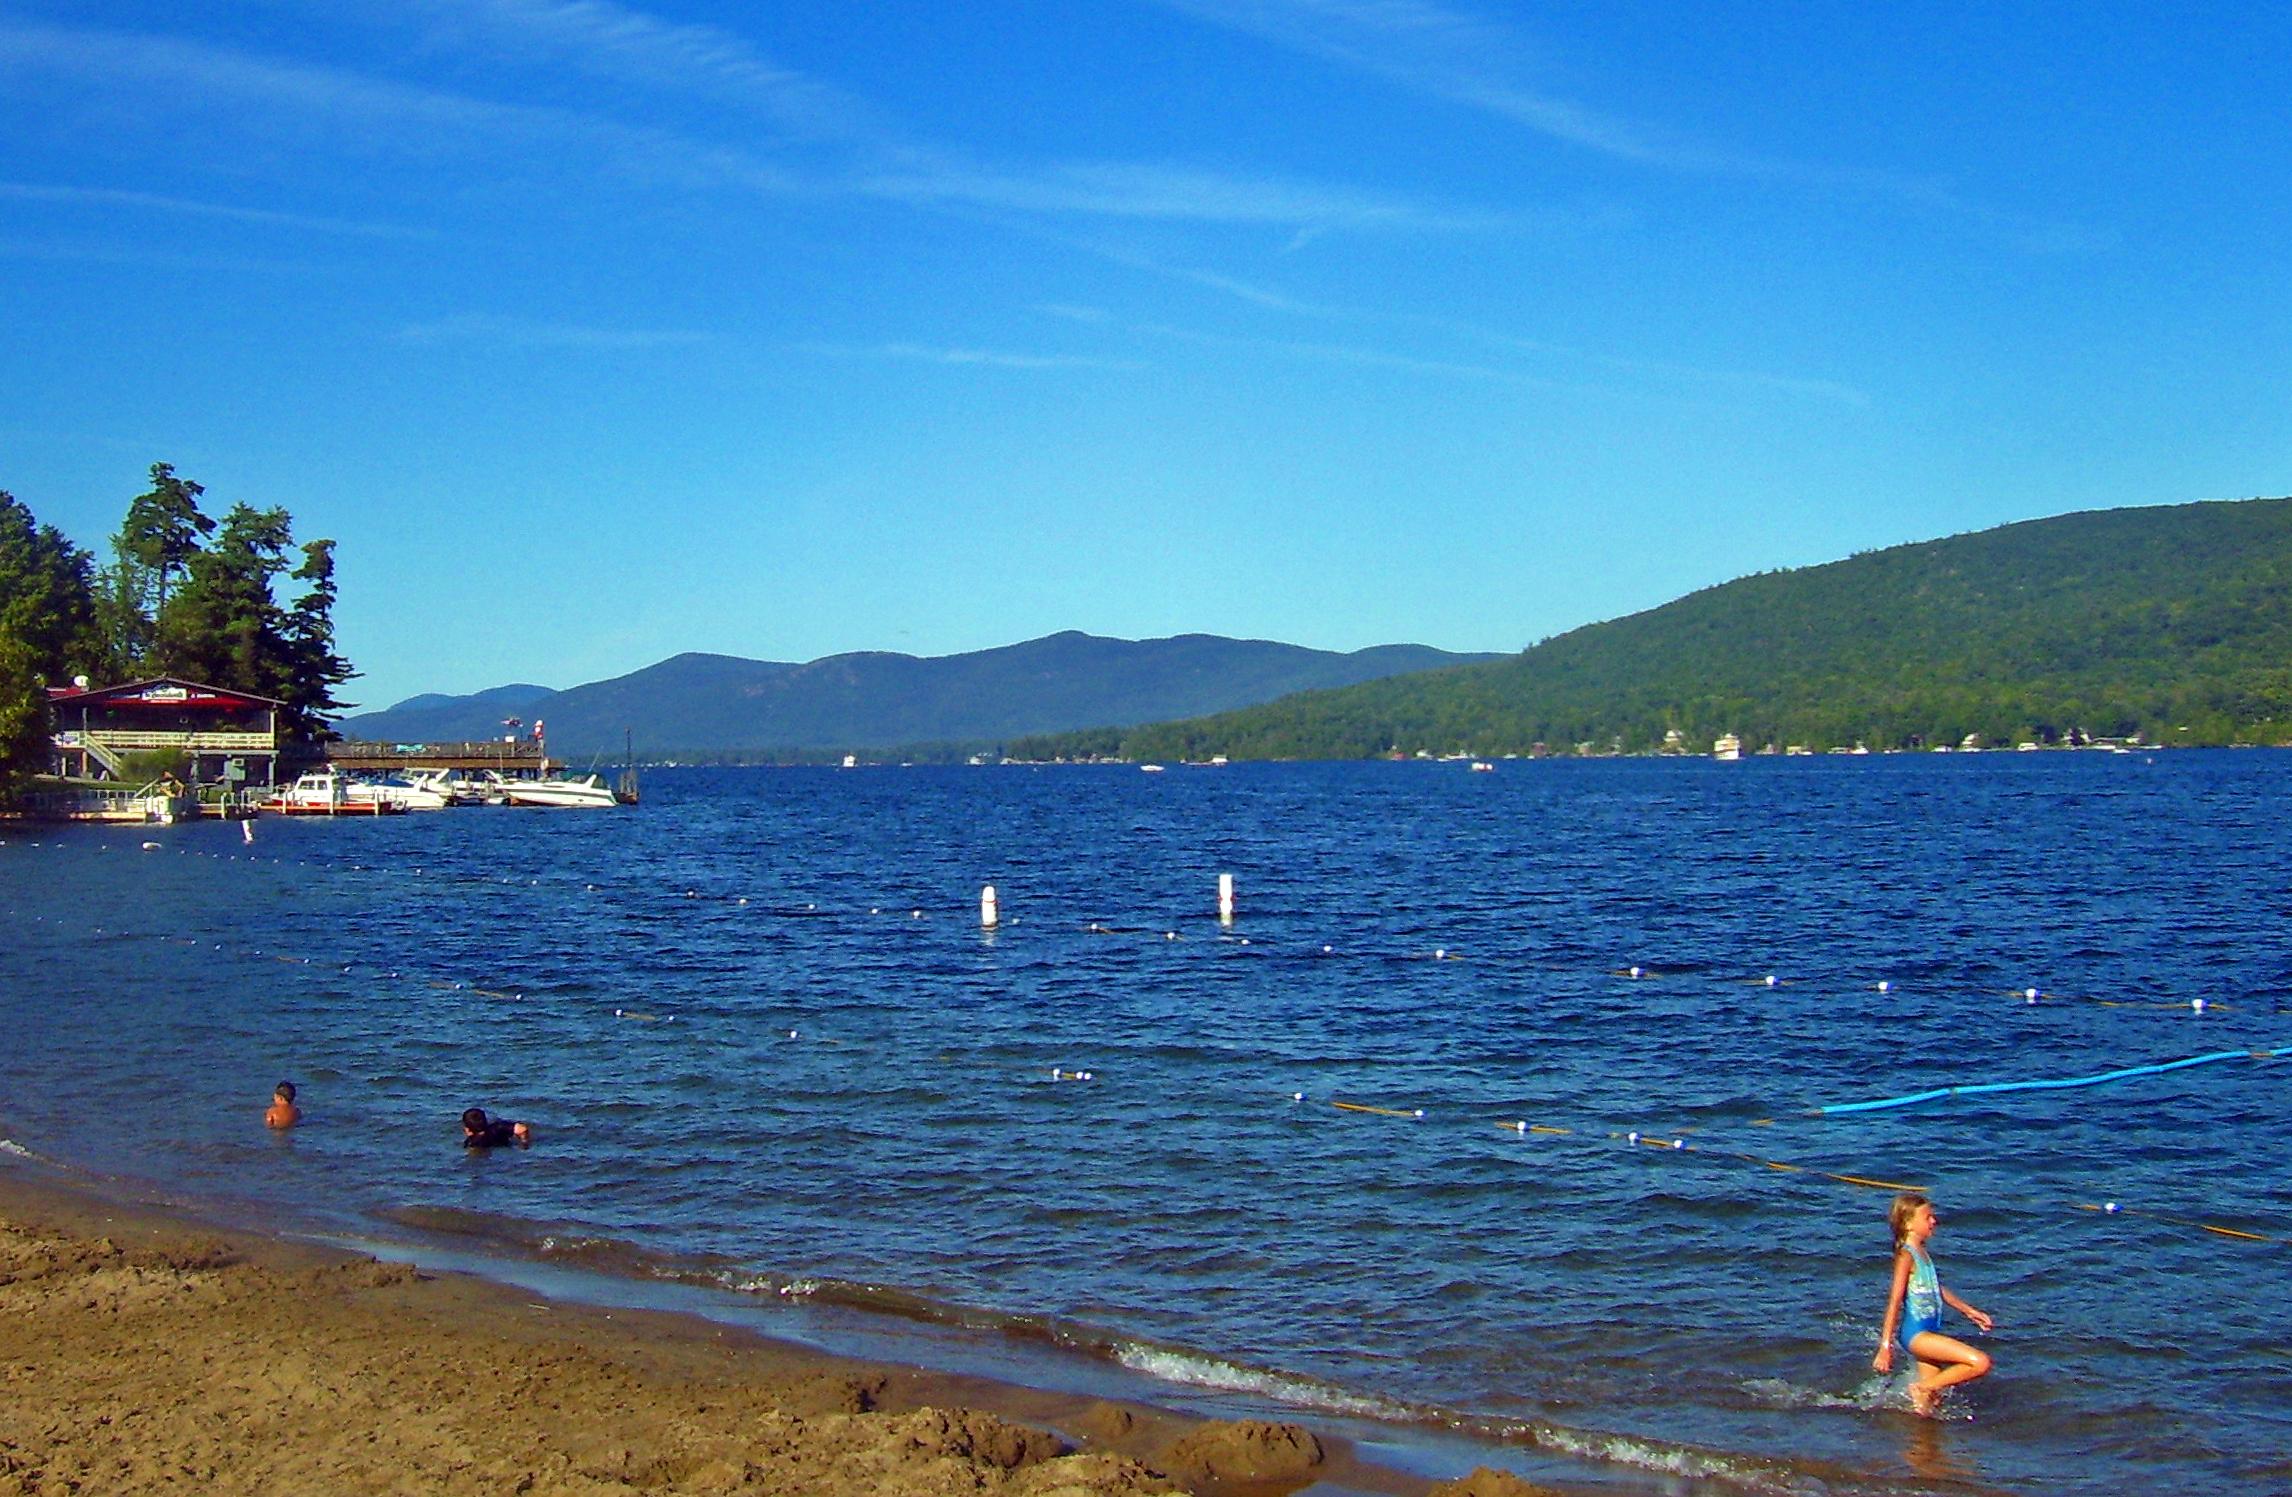 Lake_George_from_village_beach.jpglake george village